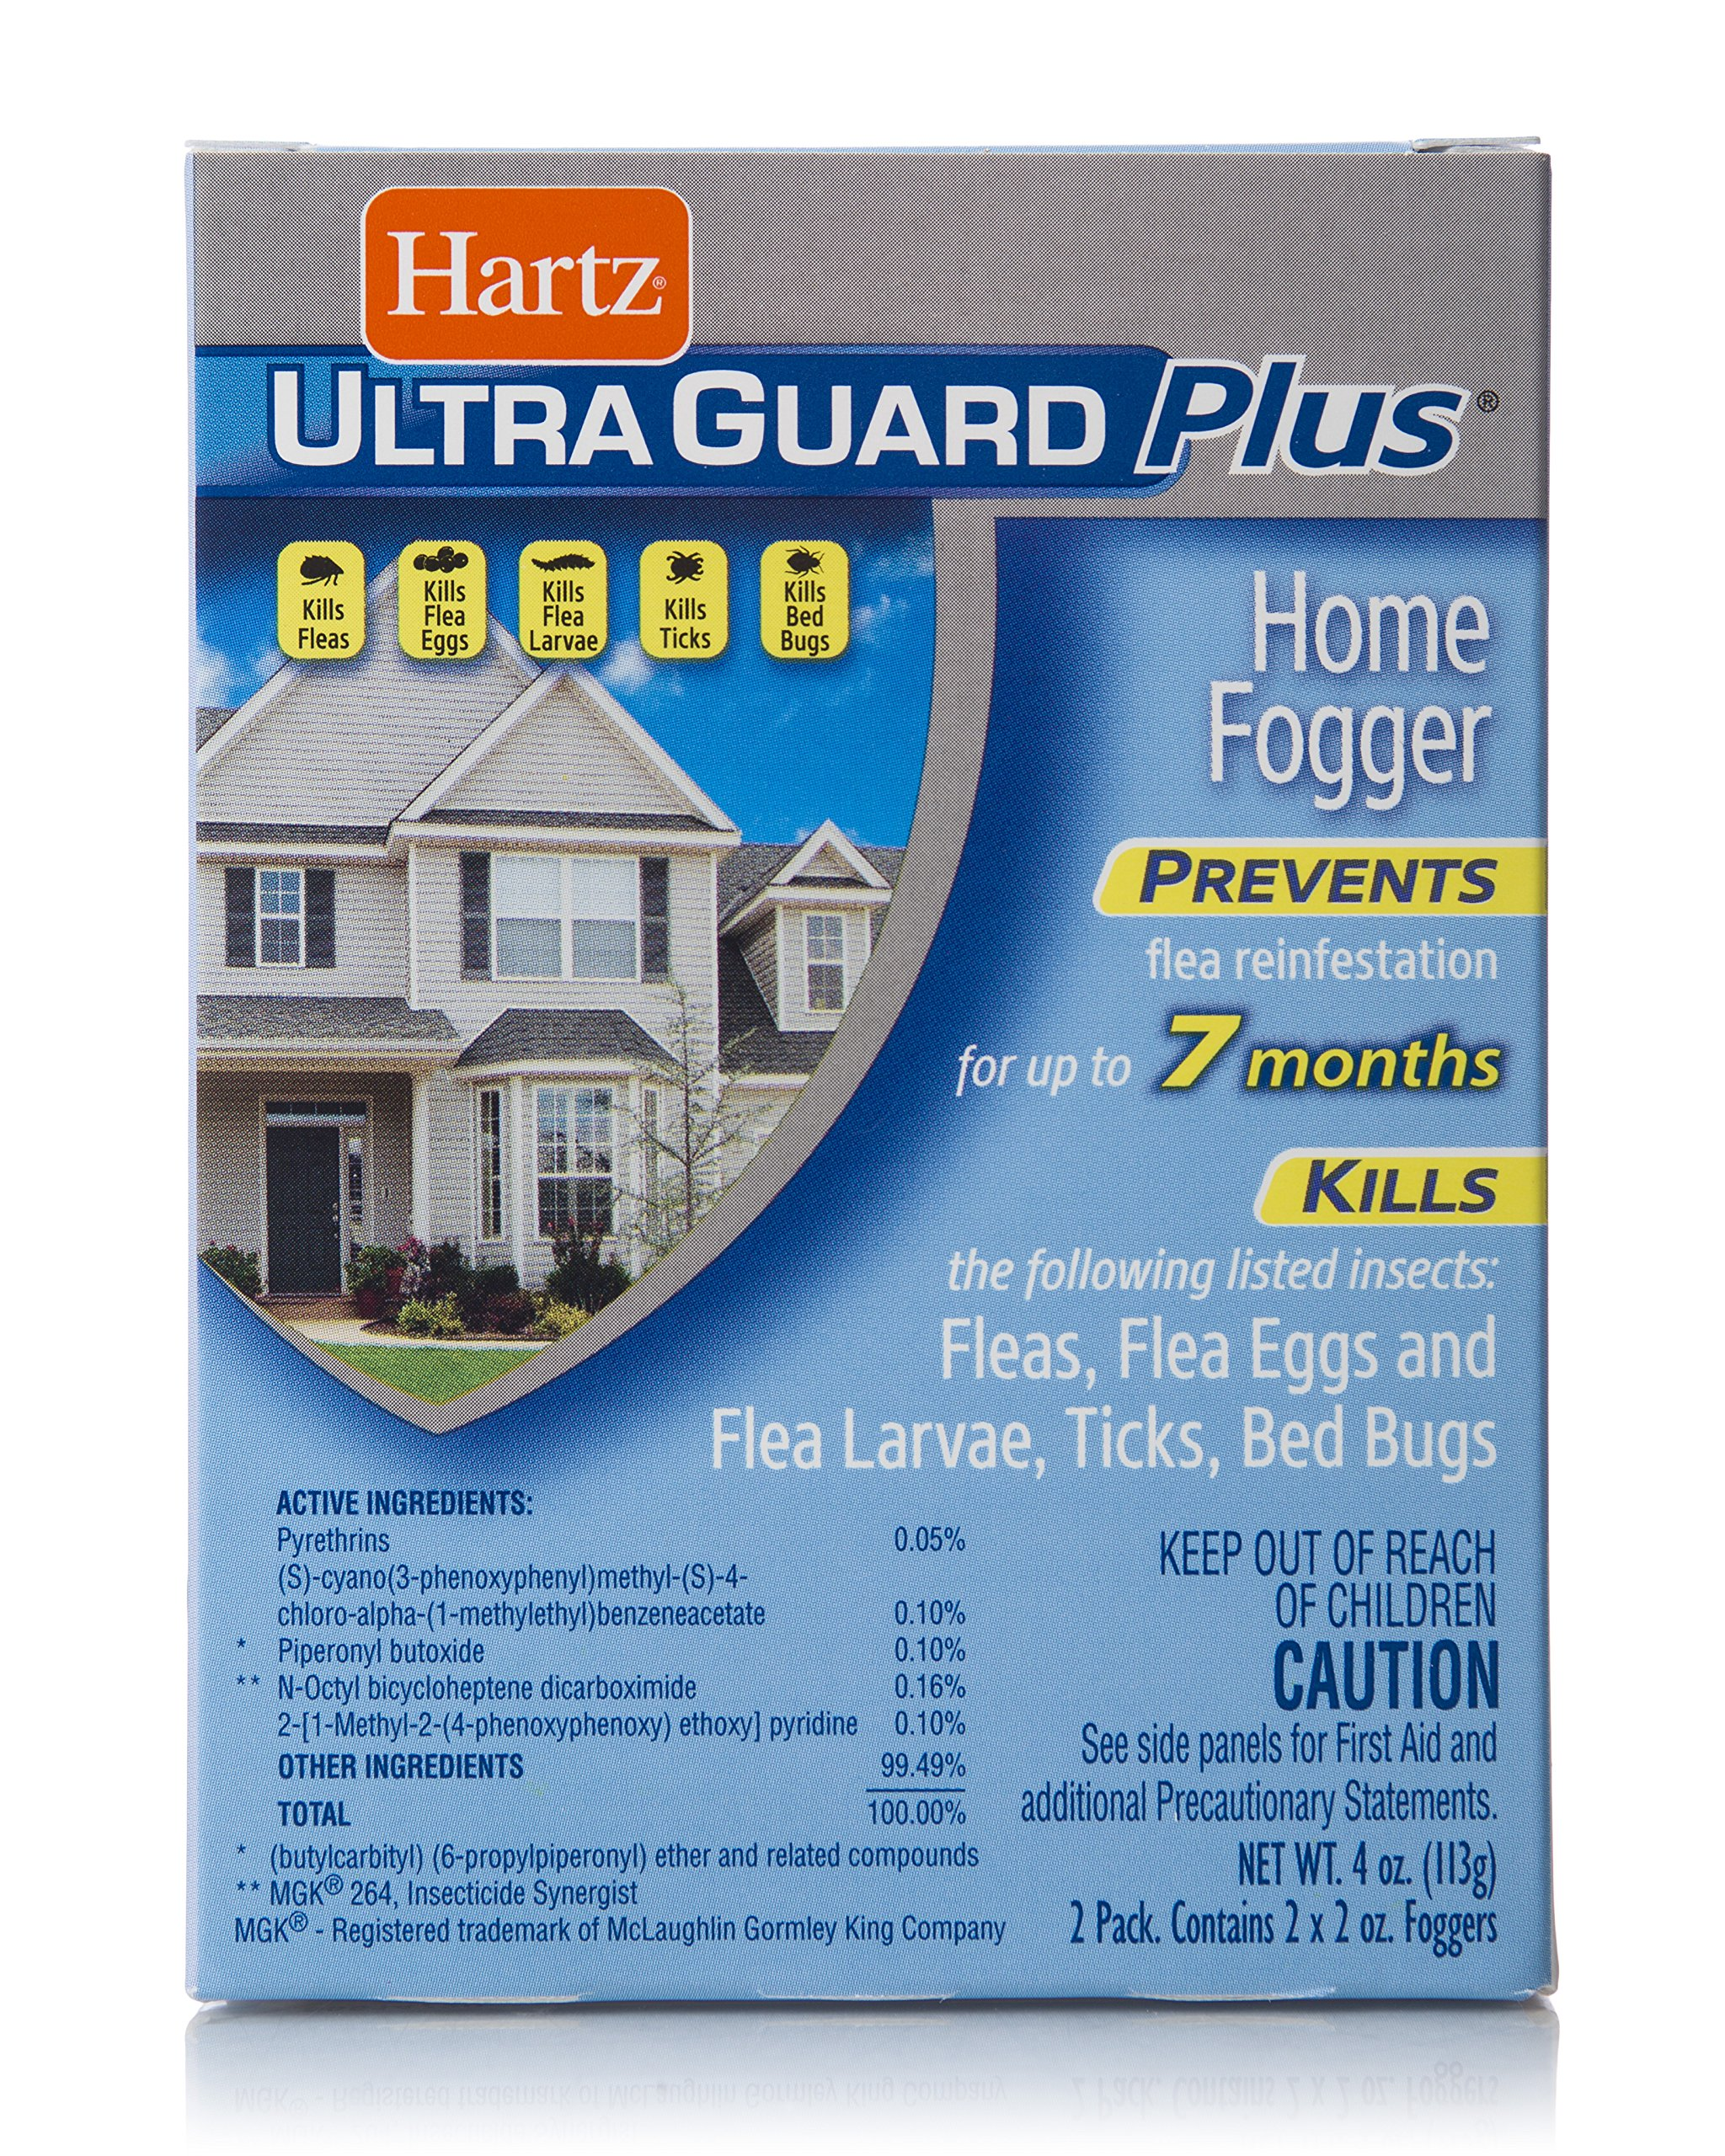 HARTZ UltraGuard Plus Flea, Tick, Bed Bug Home Fogger